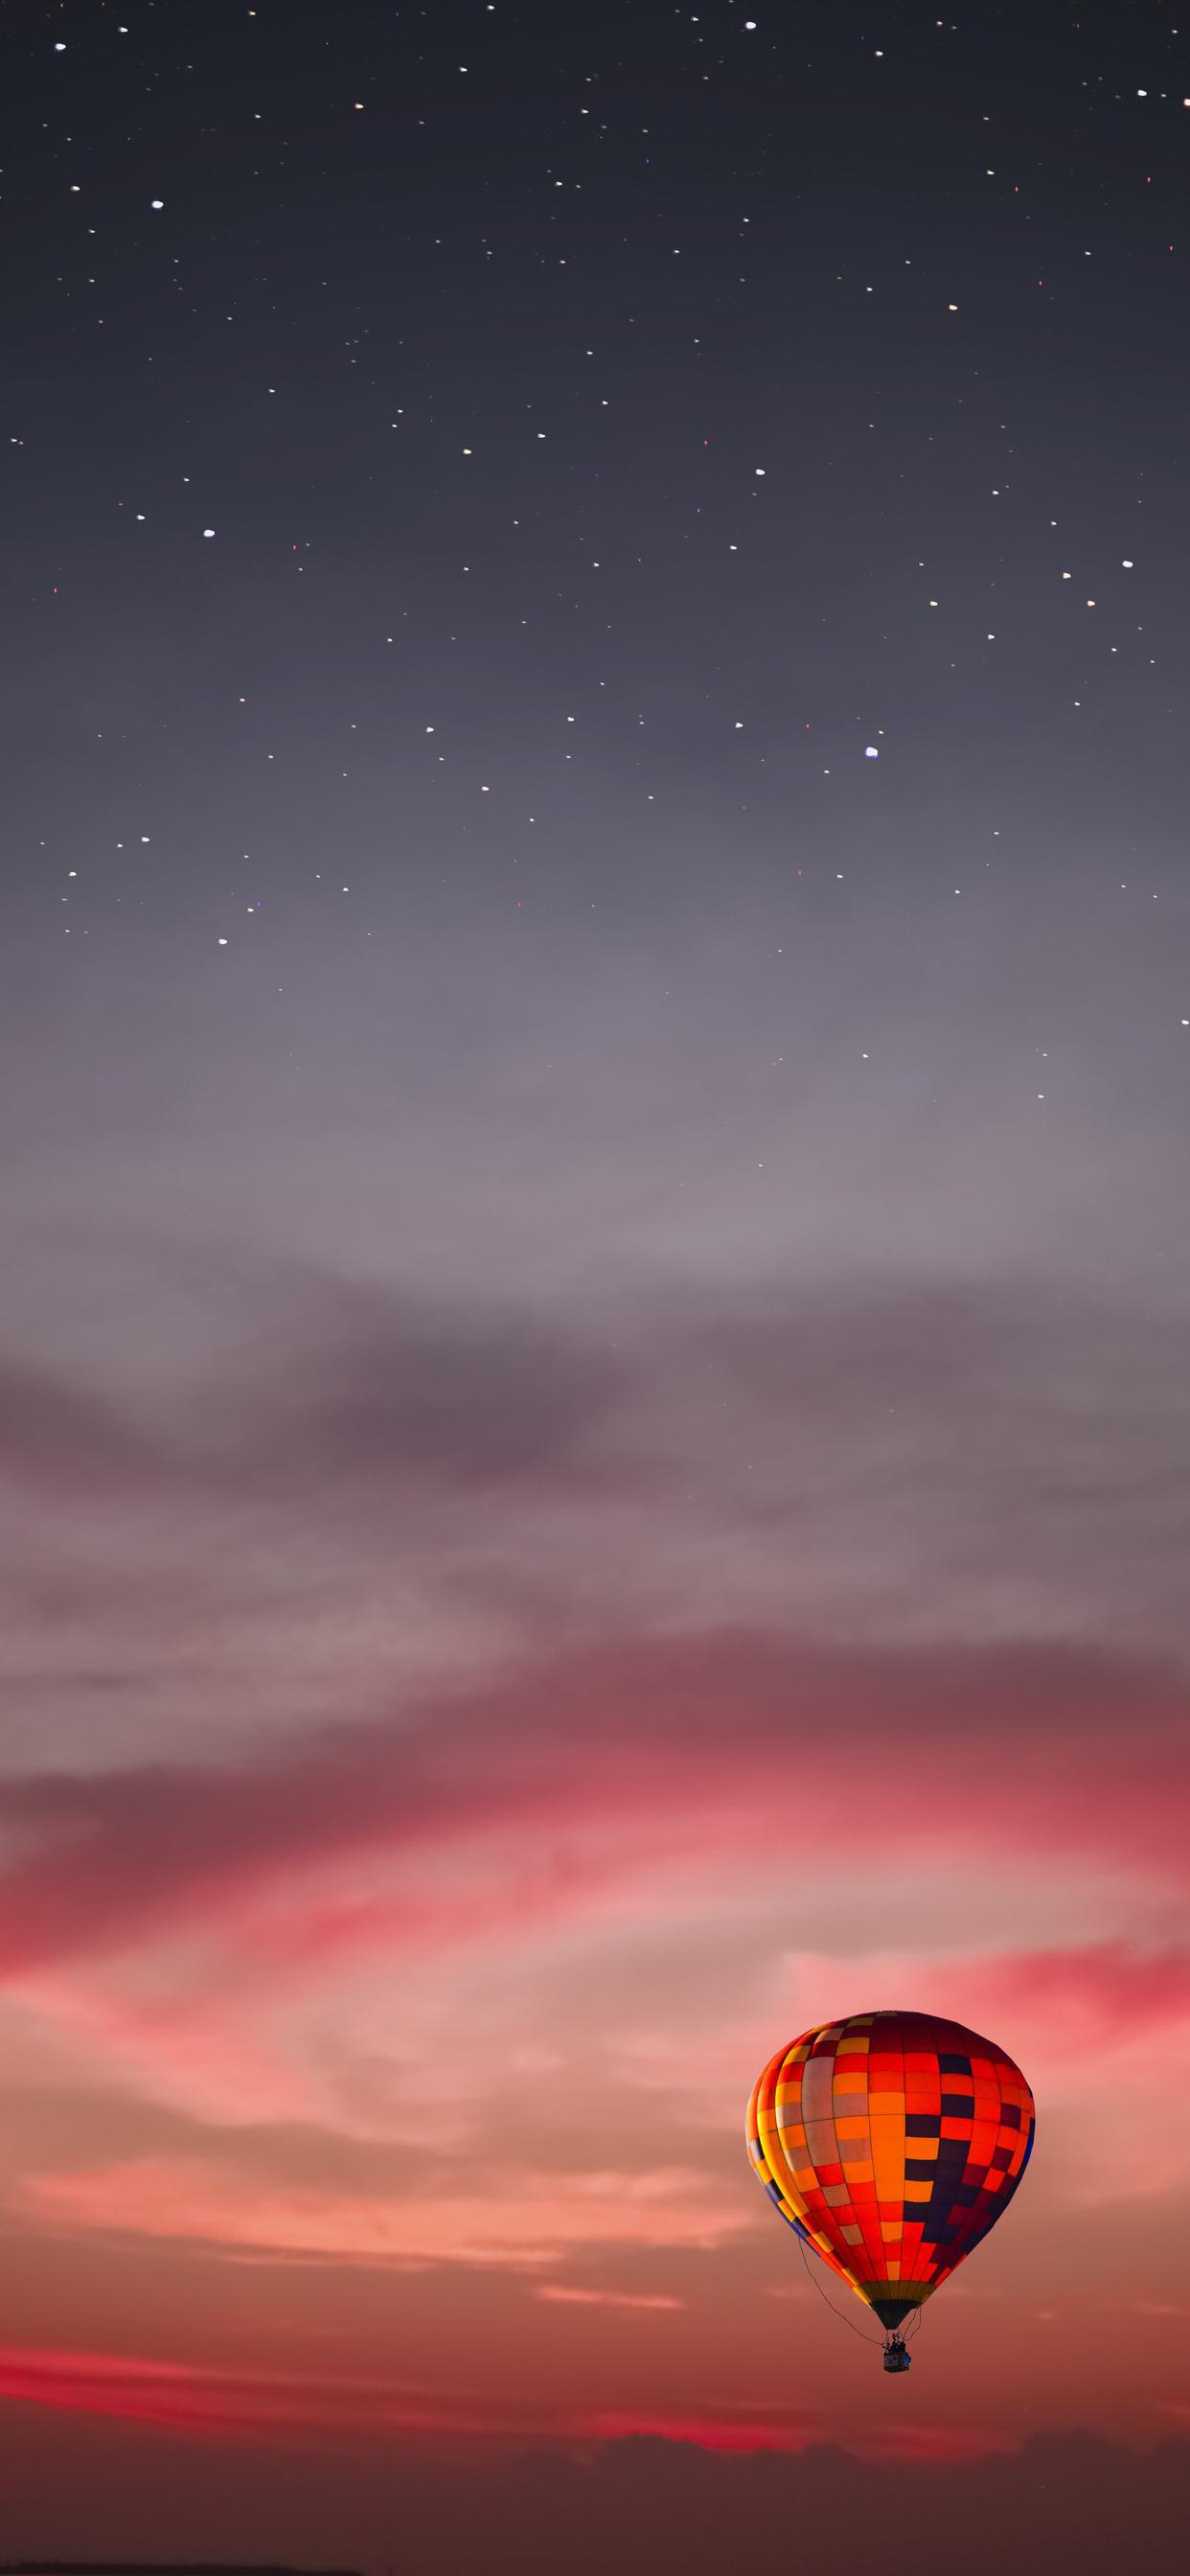 hot-air-balloon-red-sky-4k-rs.jpg